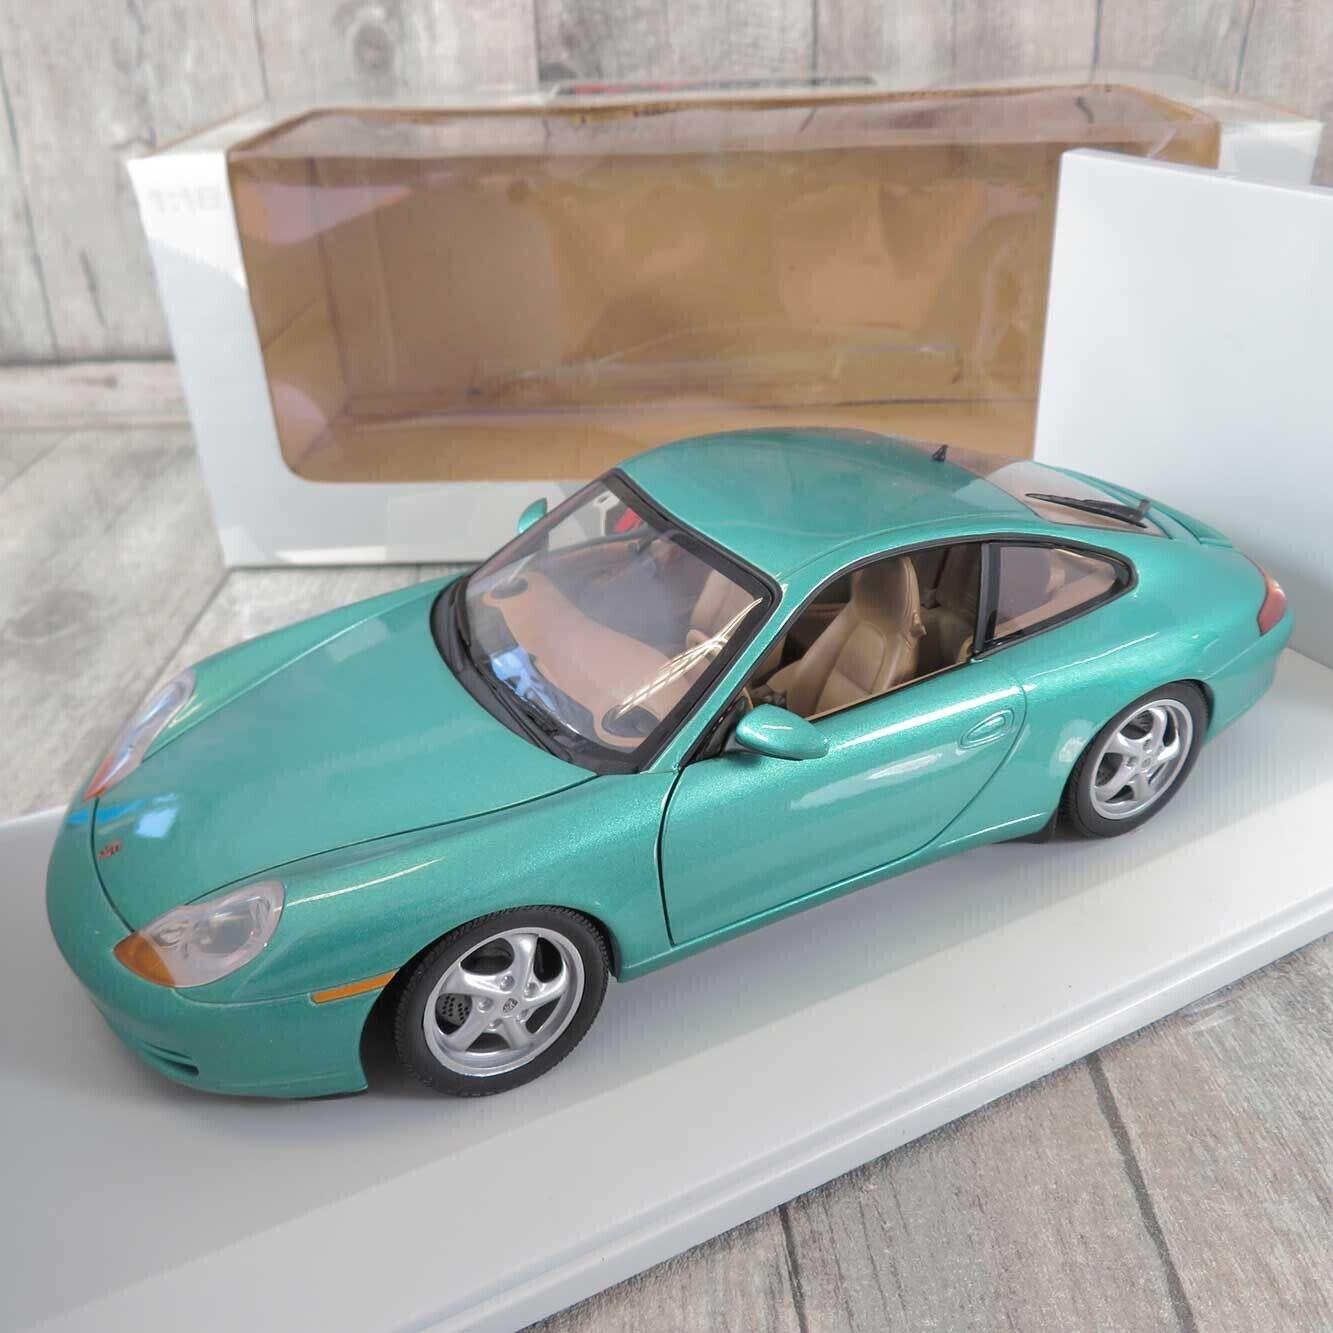 UT MODELS - 1 18 -  Porsche voiturerera - OVP- A26790  qualité pas cher et top